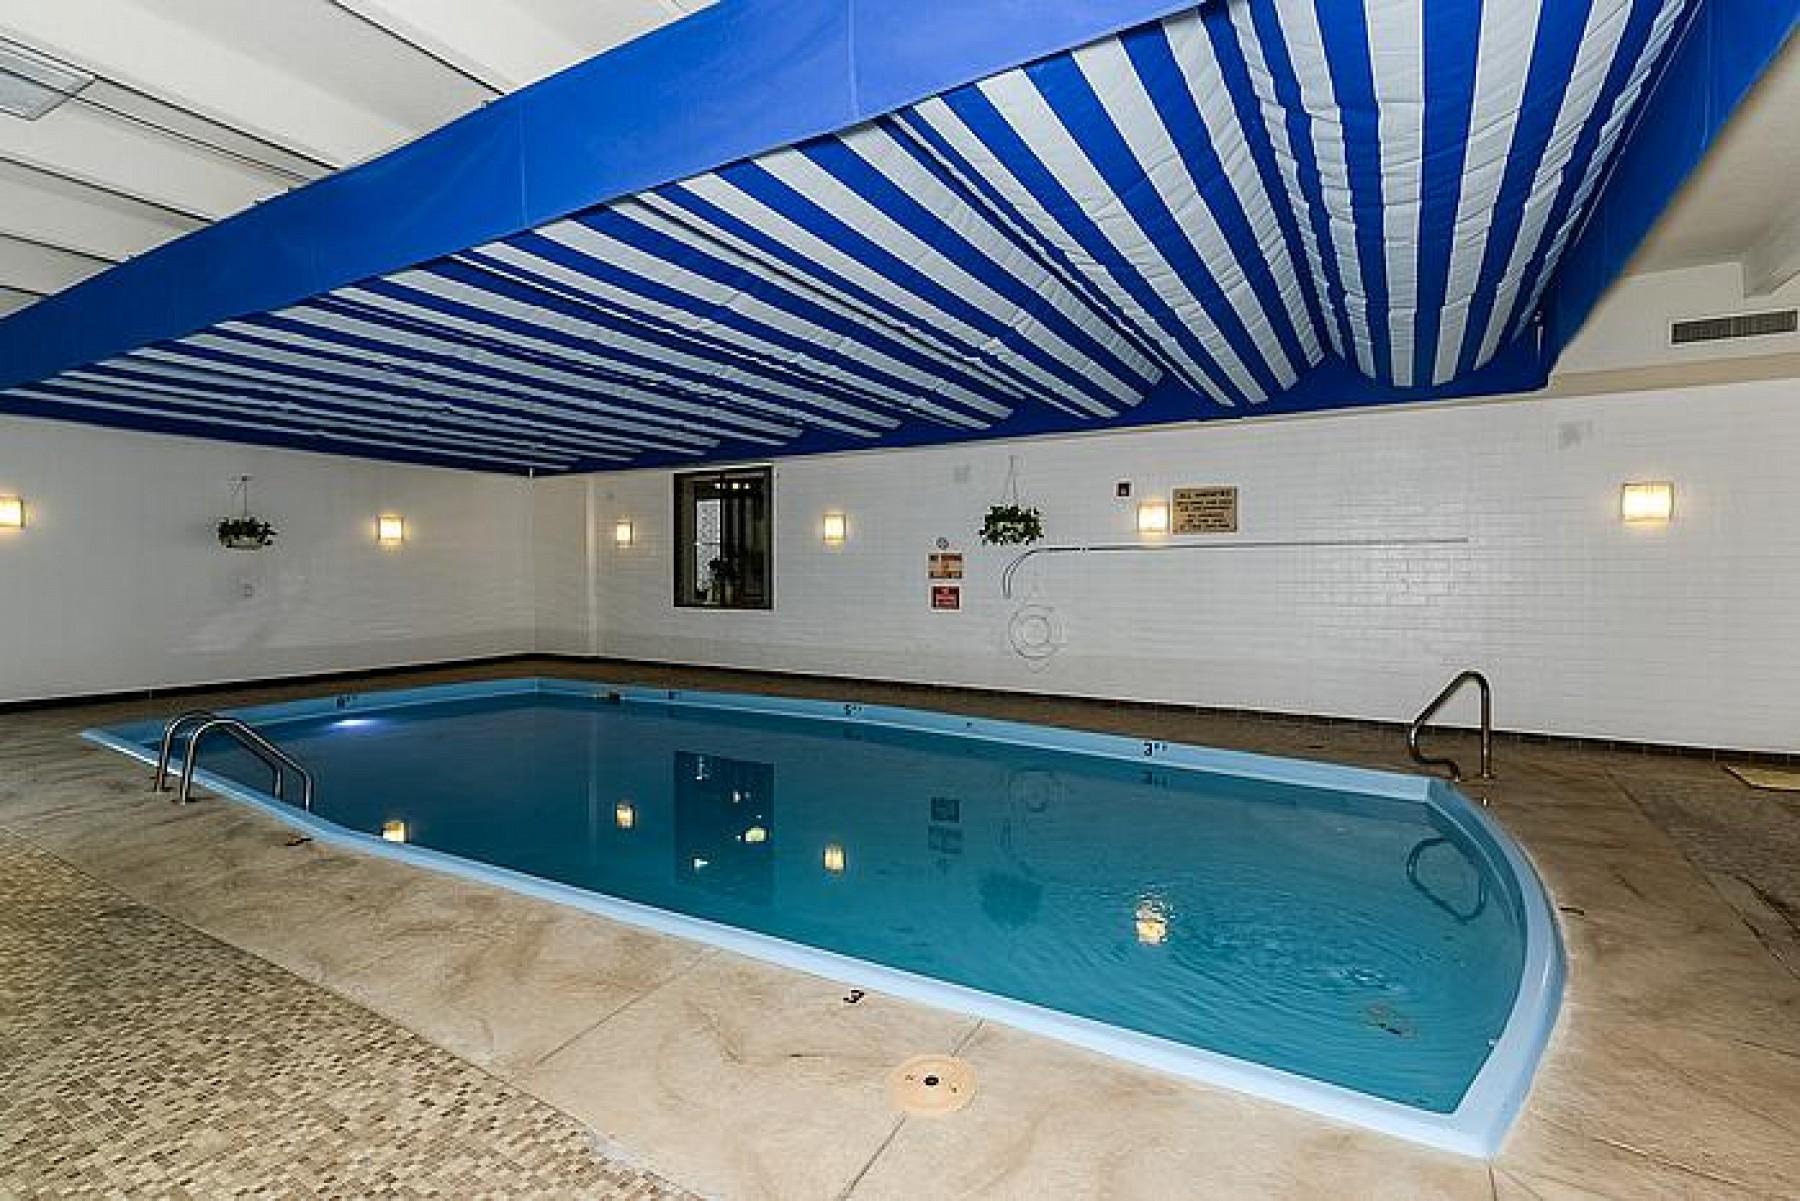 Single Family Homes Cherry Creek : Denver Co Homes for Sale ...